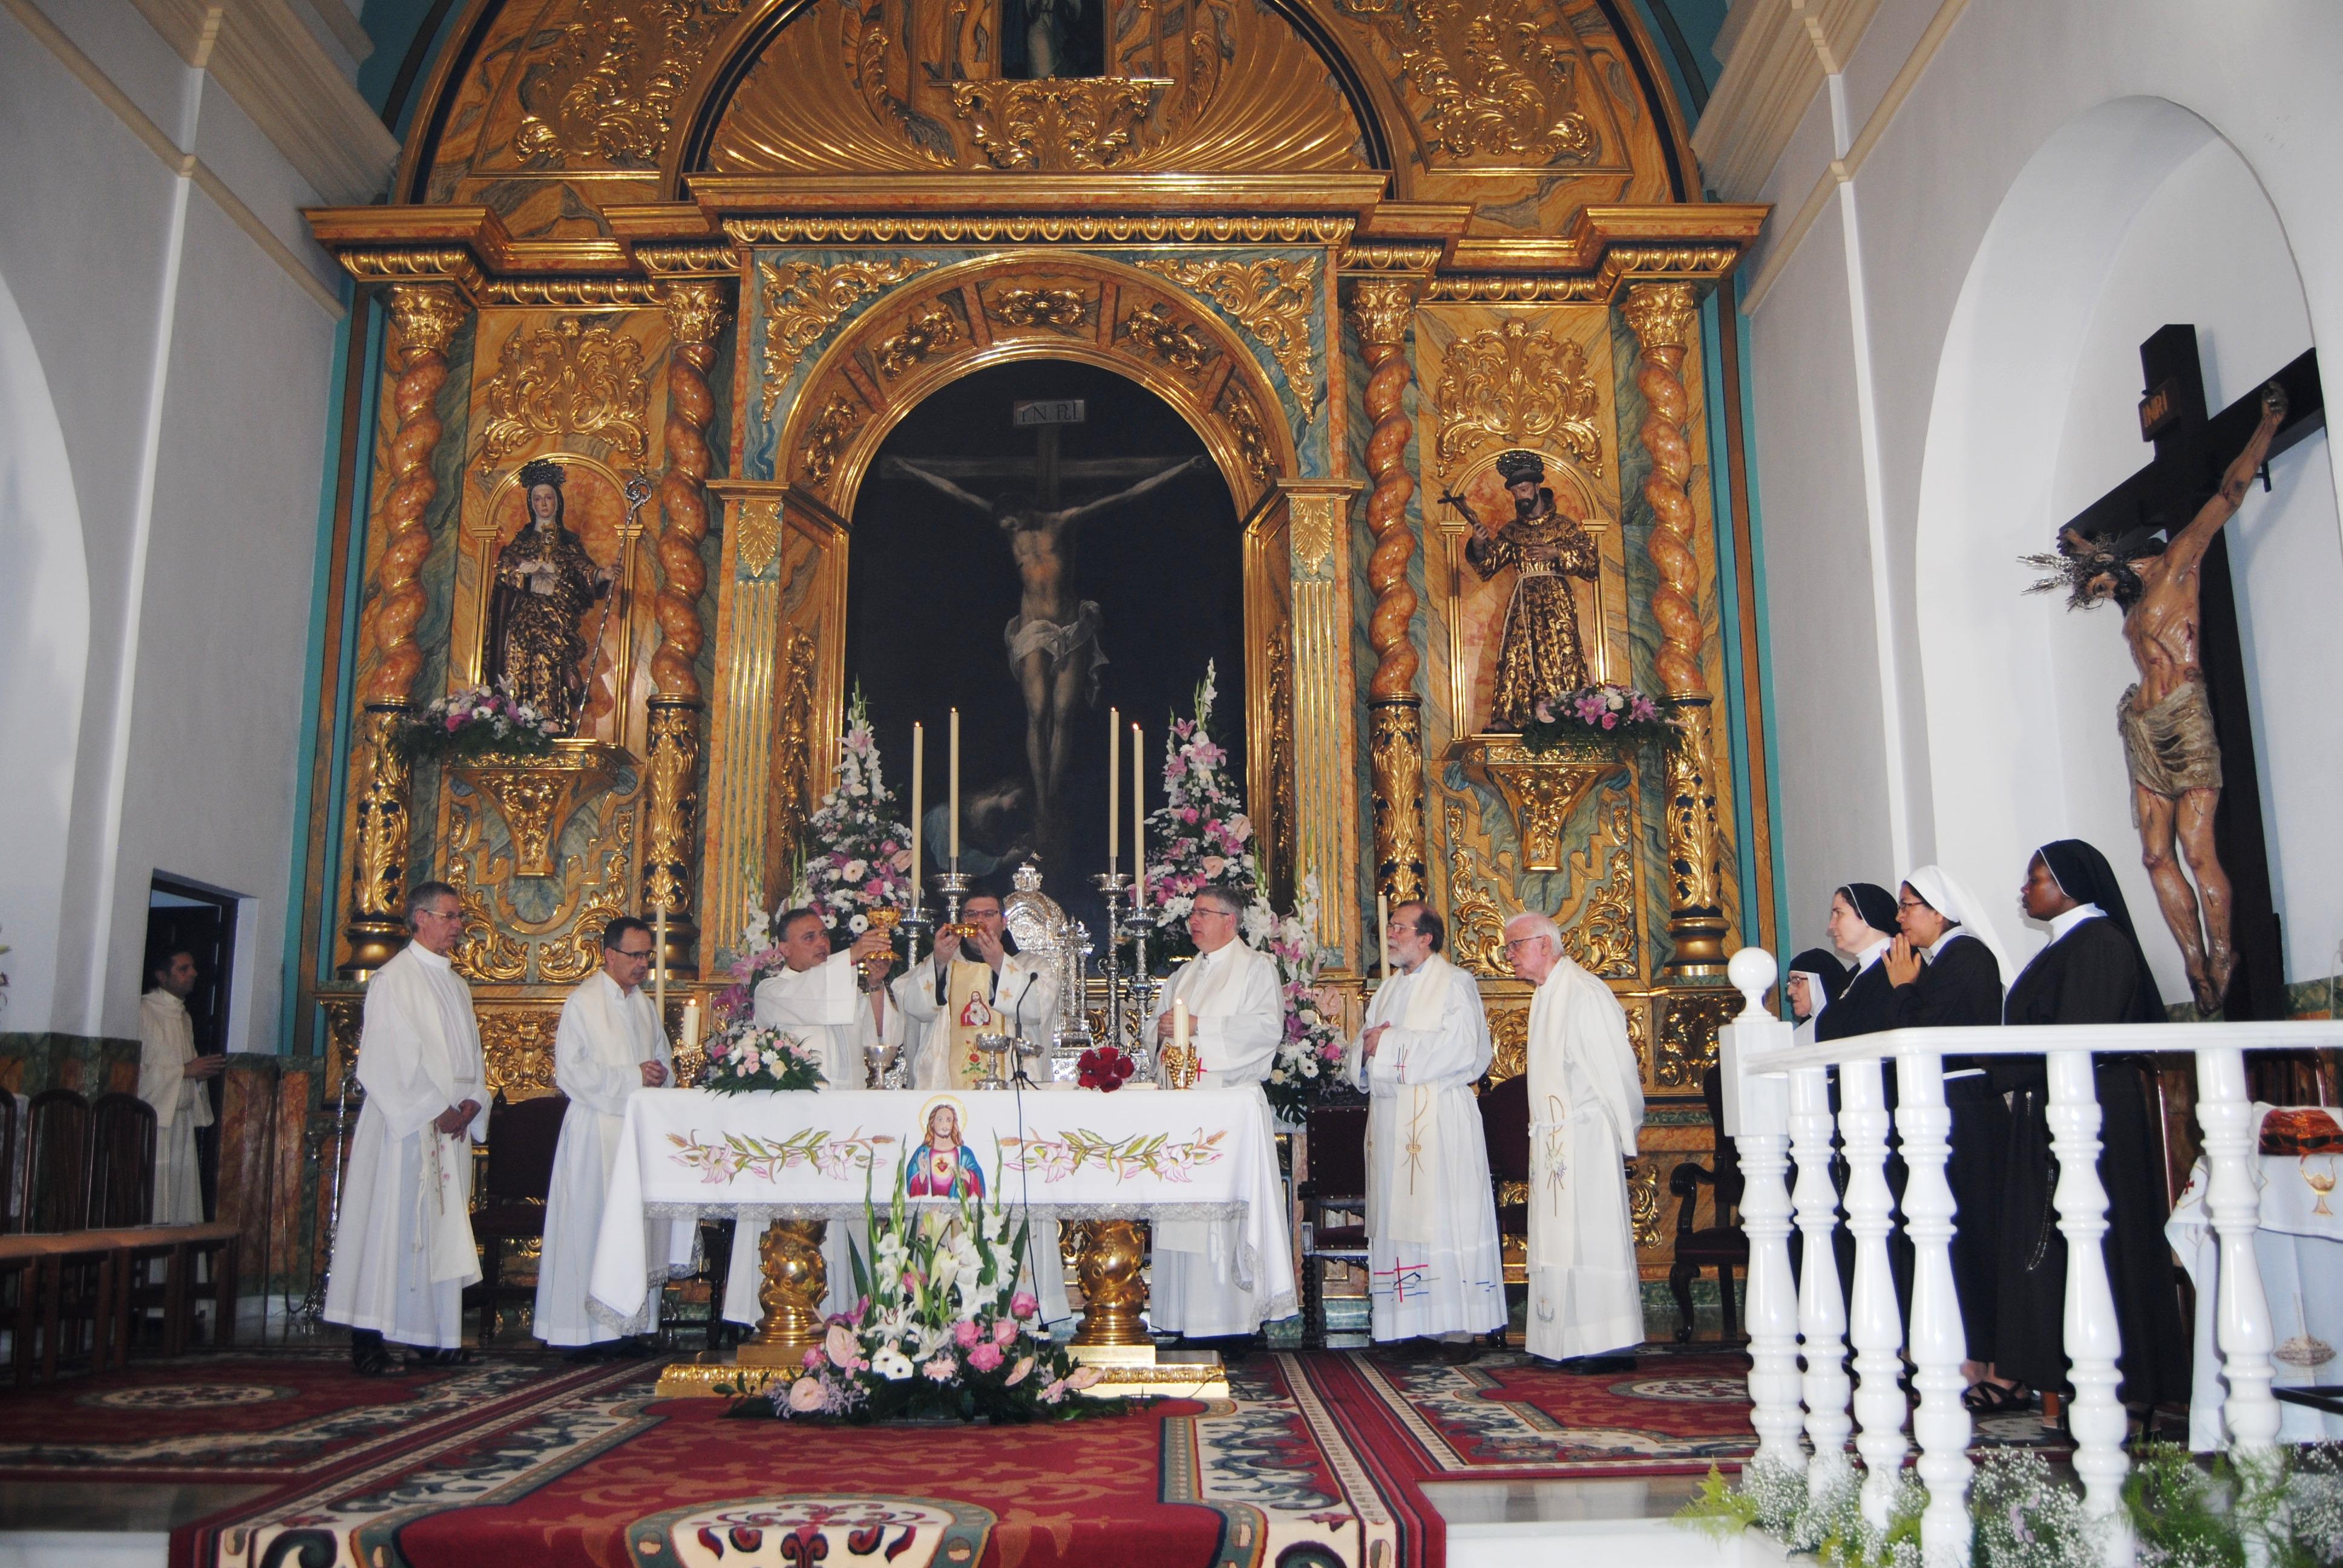 Capilla del Monasterio de Santa Clara de Alcalá de Guadaíra